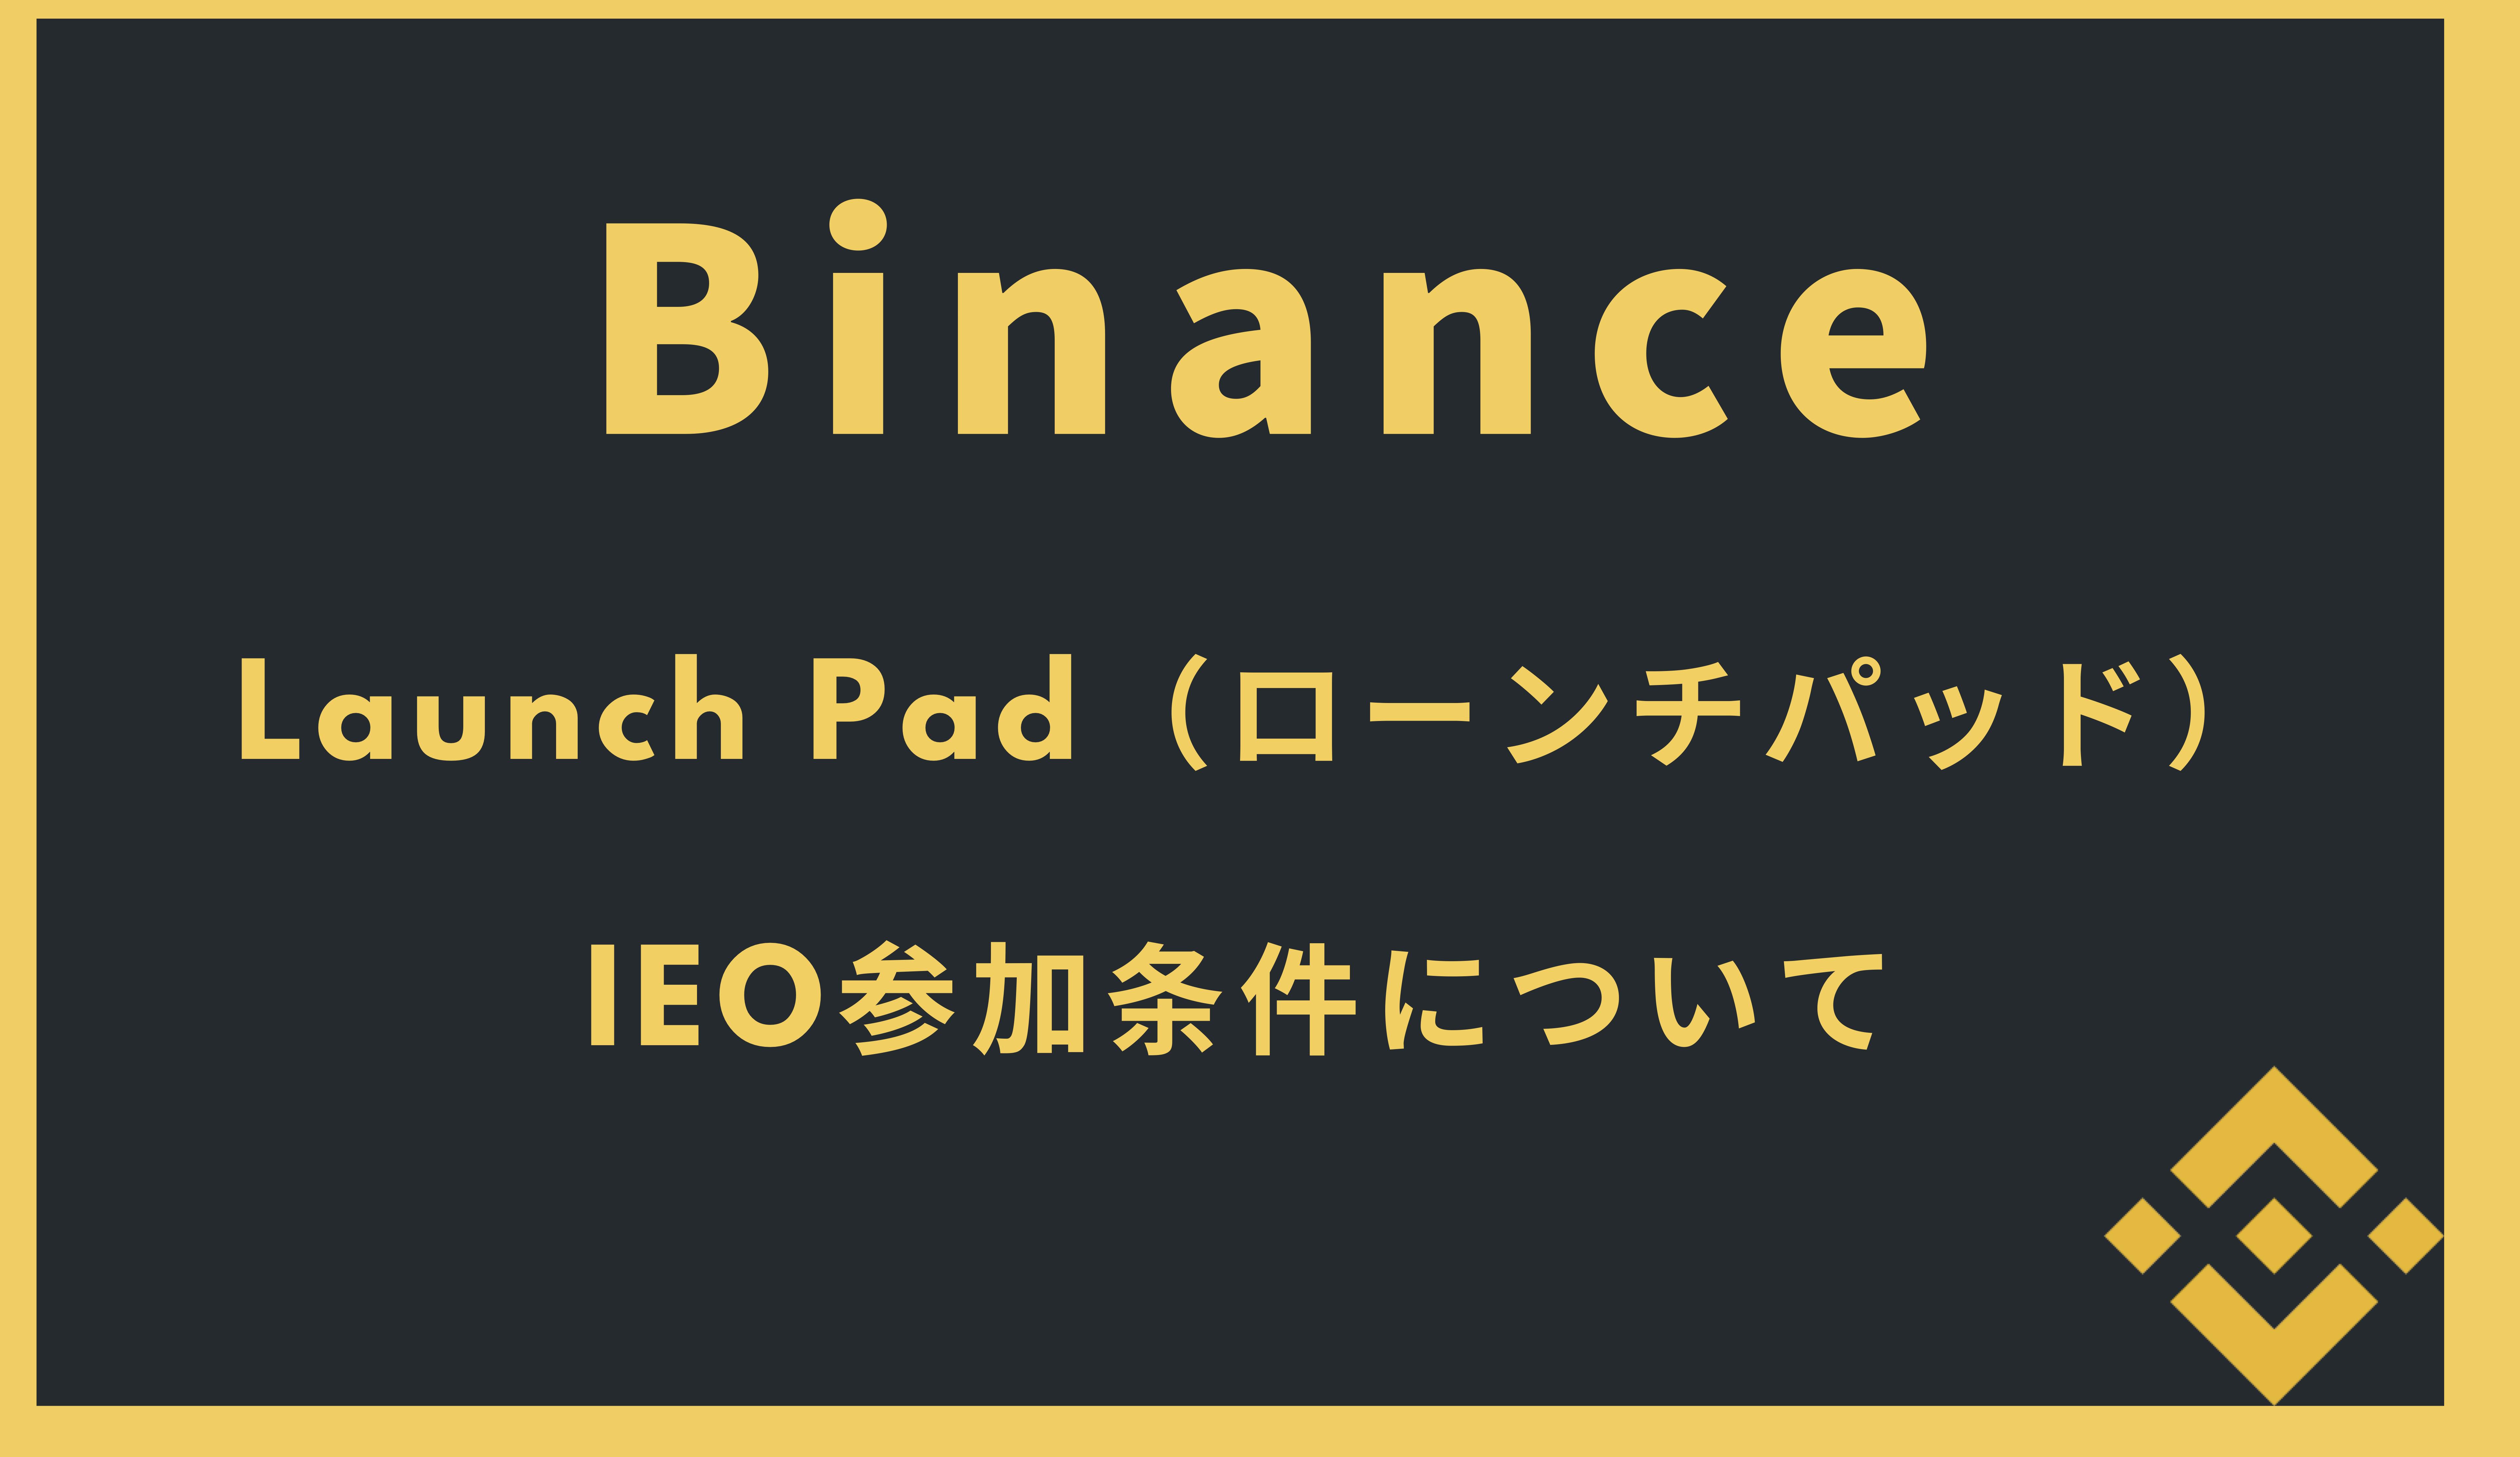 Binance LaunchPad(ローンチパッド)を理解してIEOに参加しよう